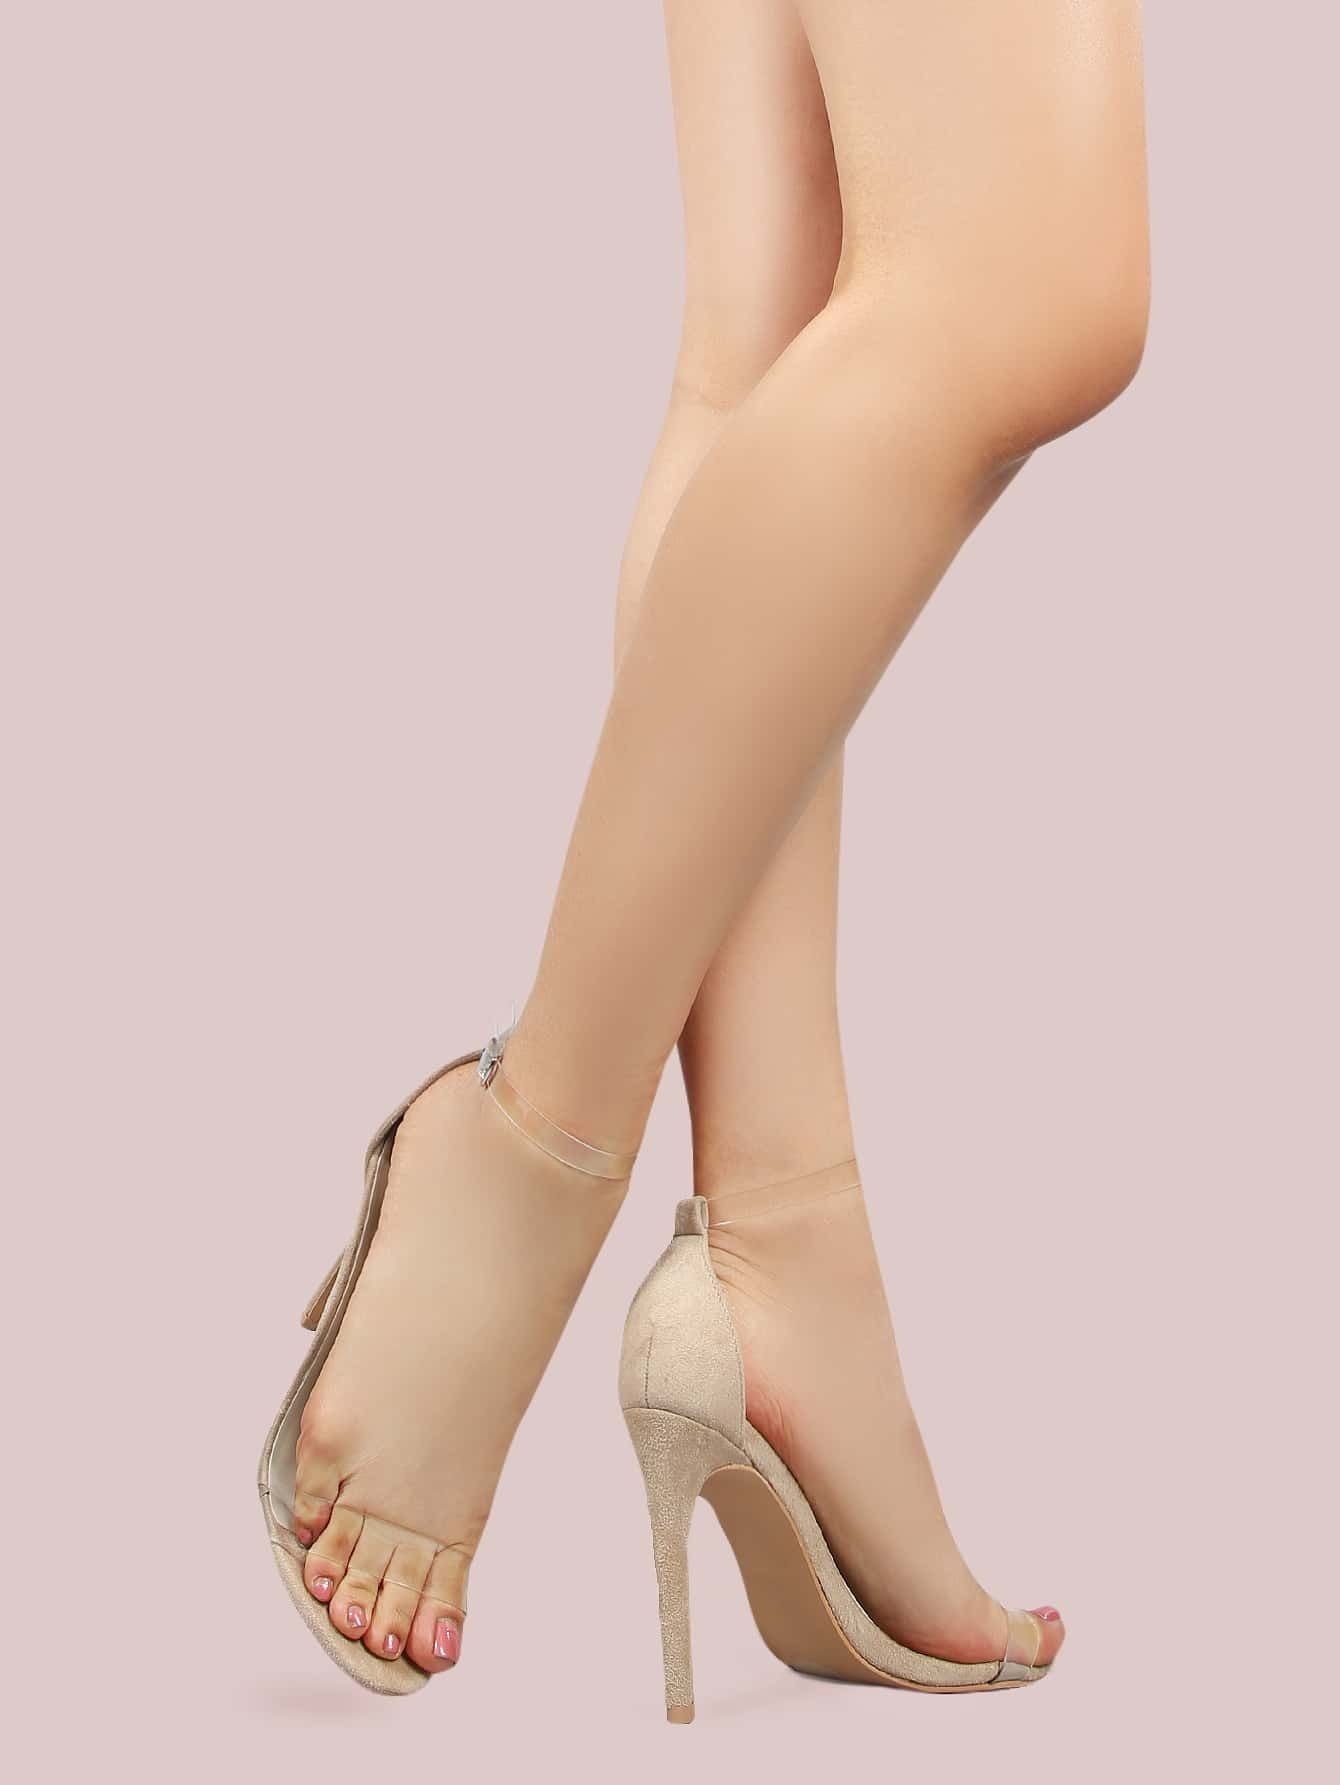 Women Naked In Stilettos 42